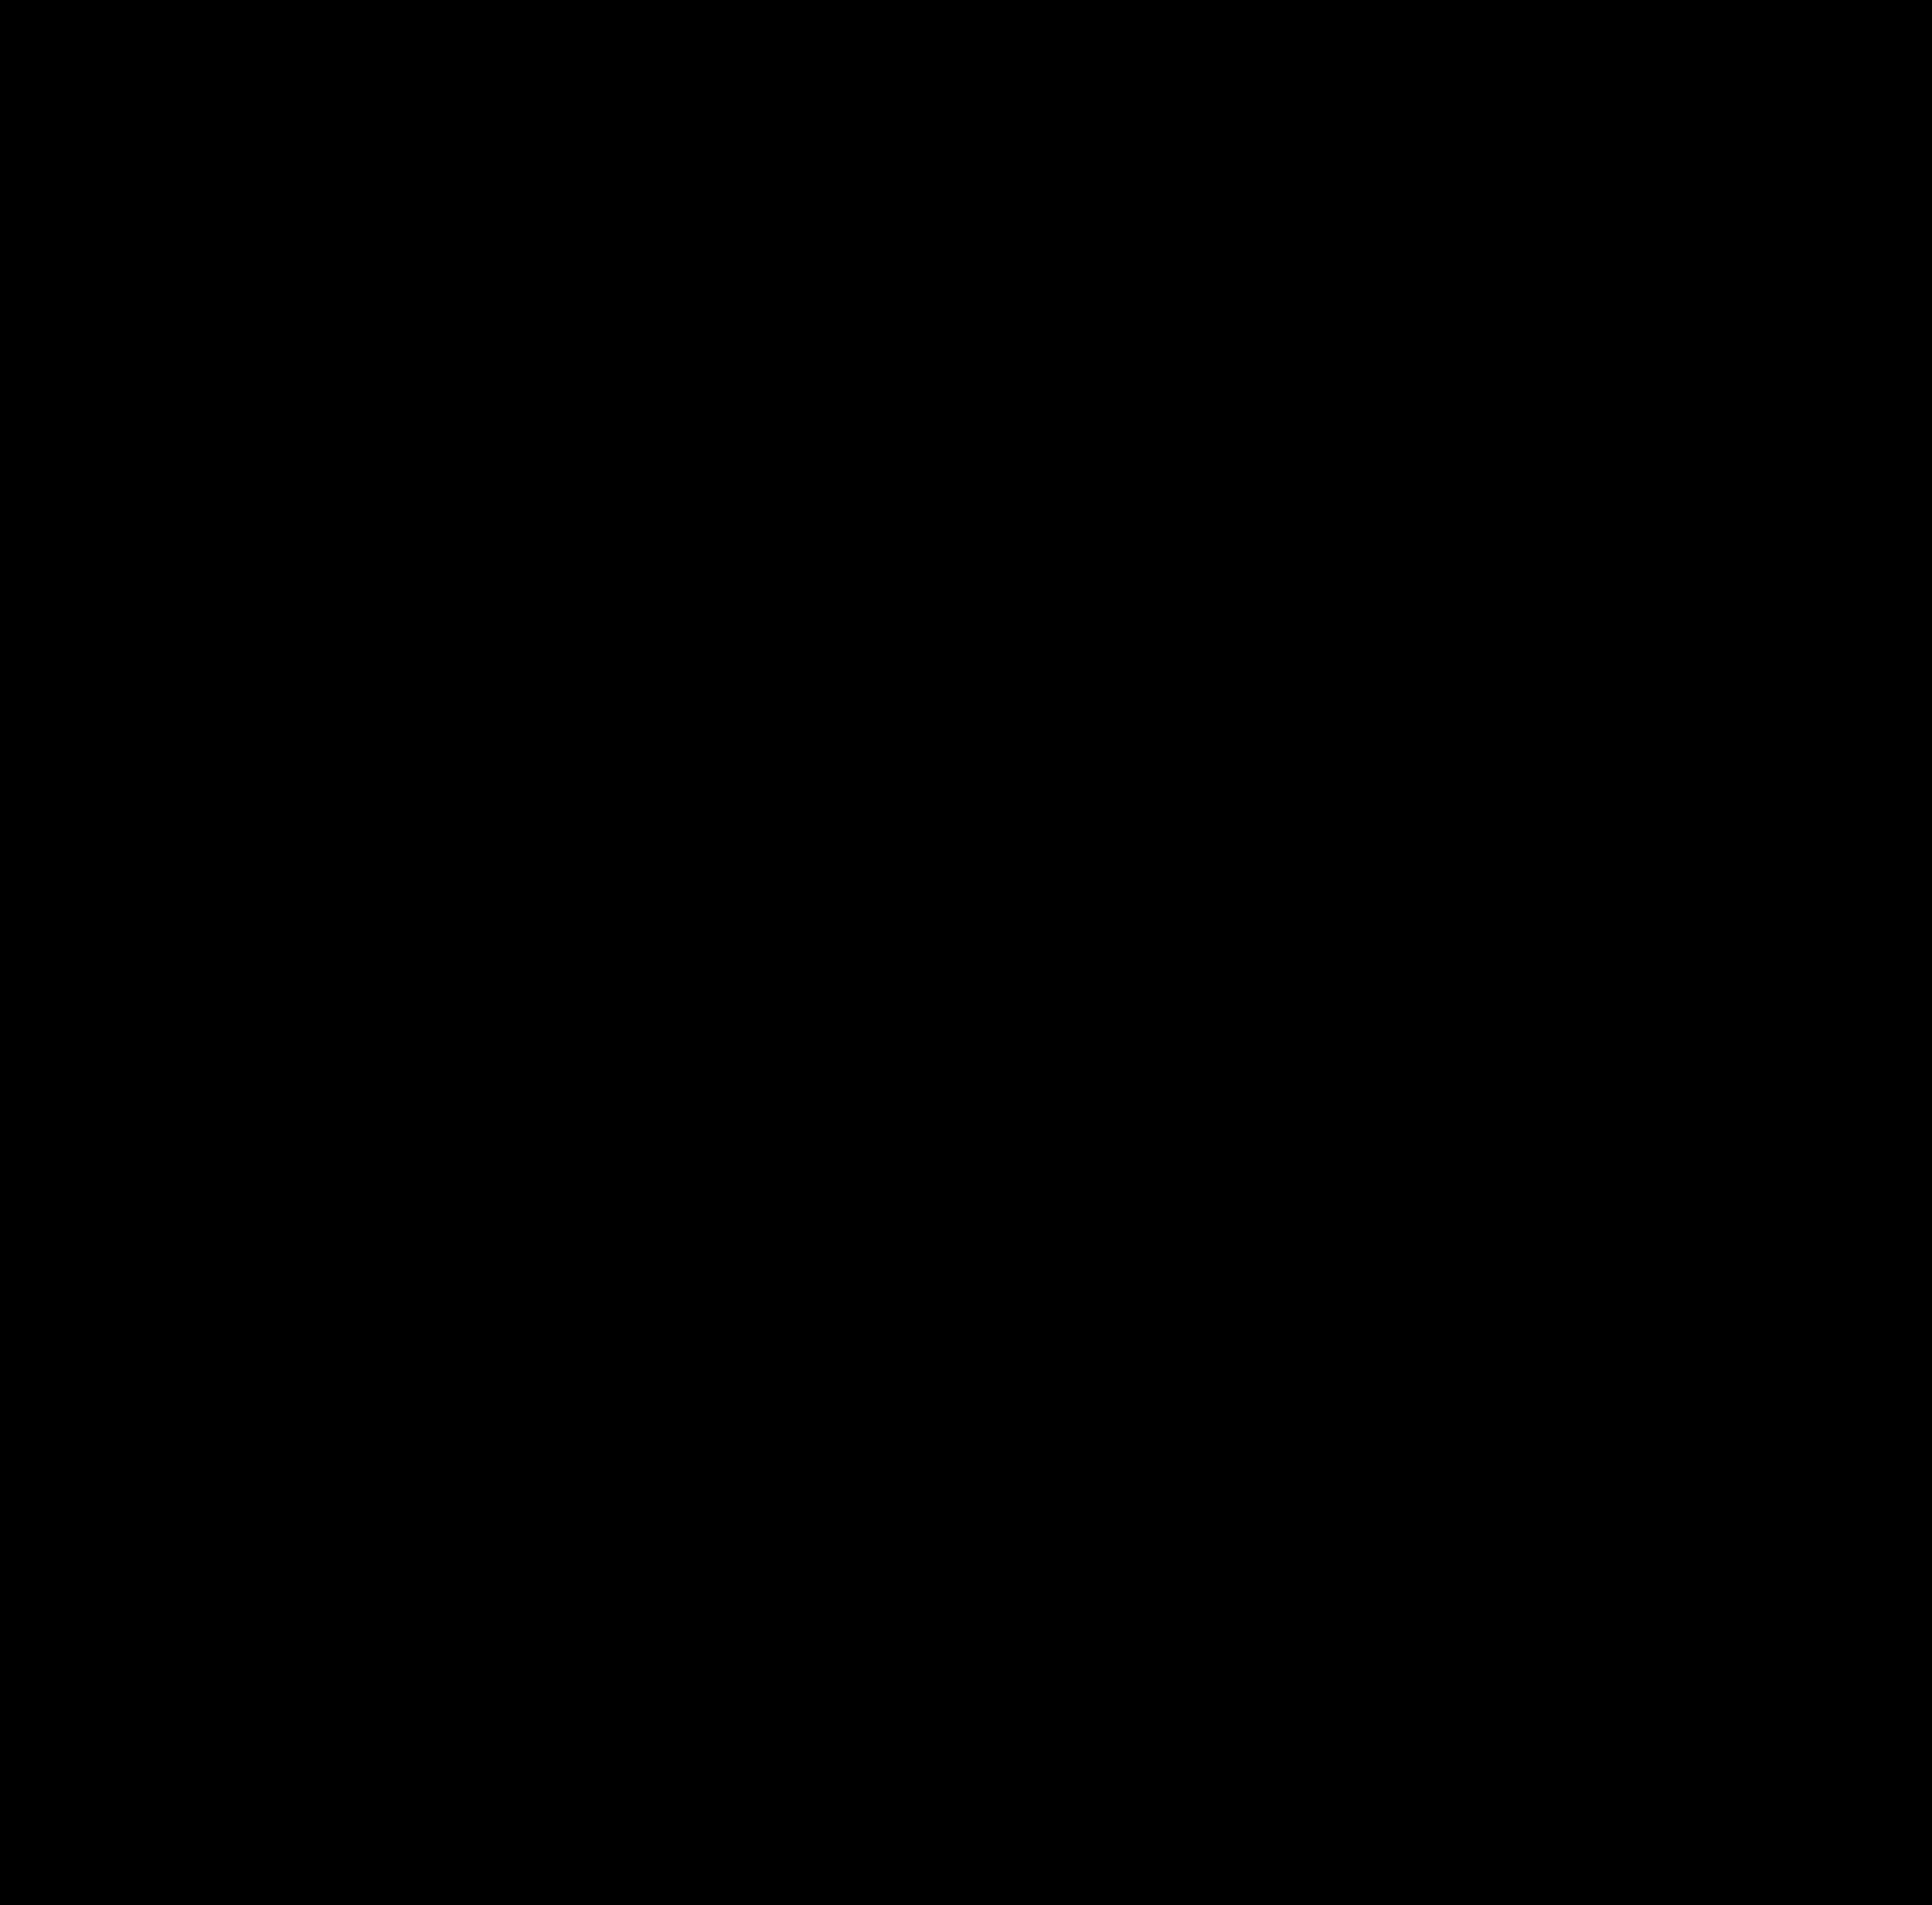 Pastel de Tiñoso (Cabracho) 94 g